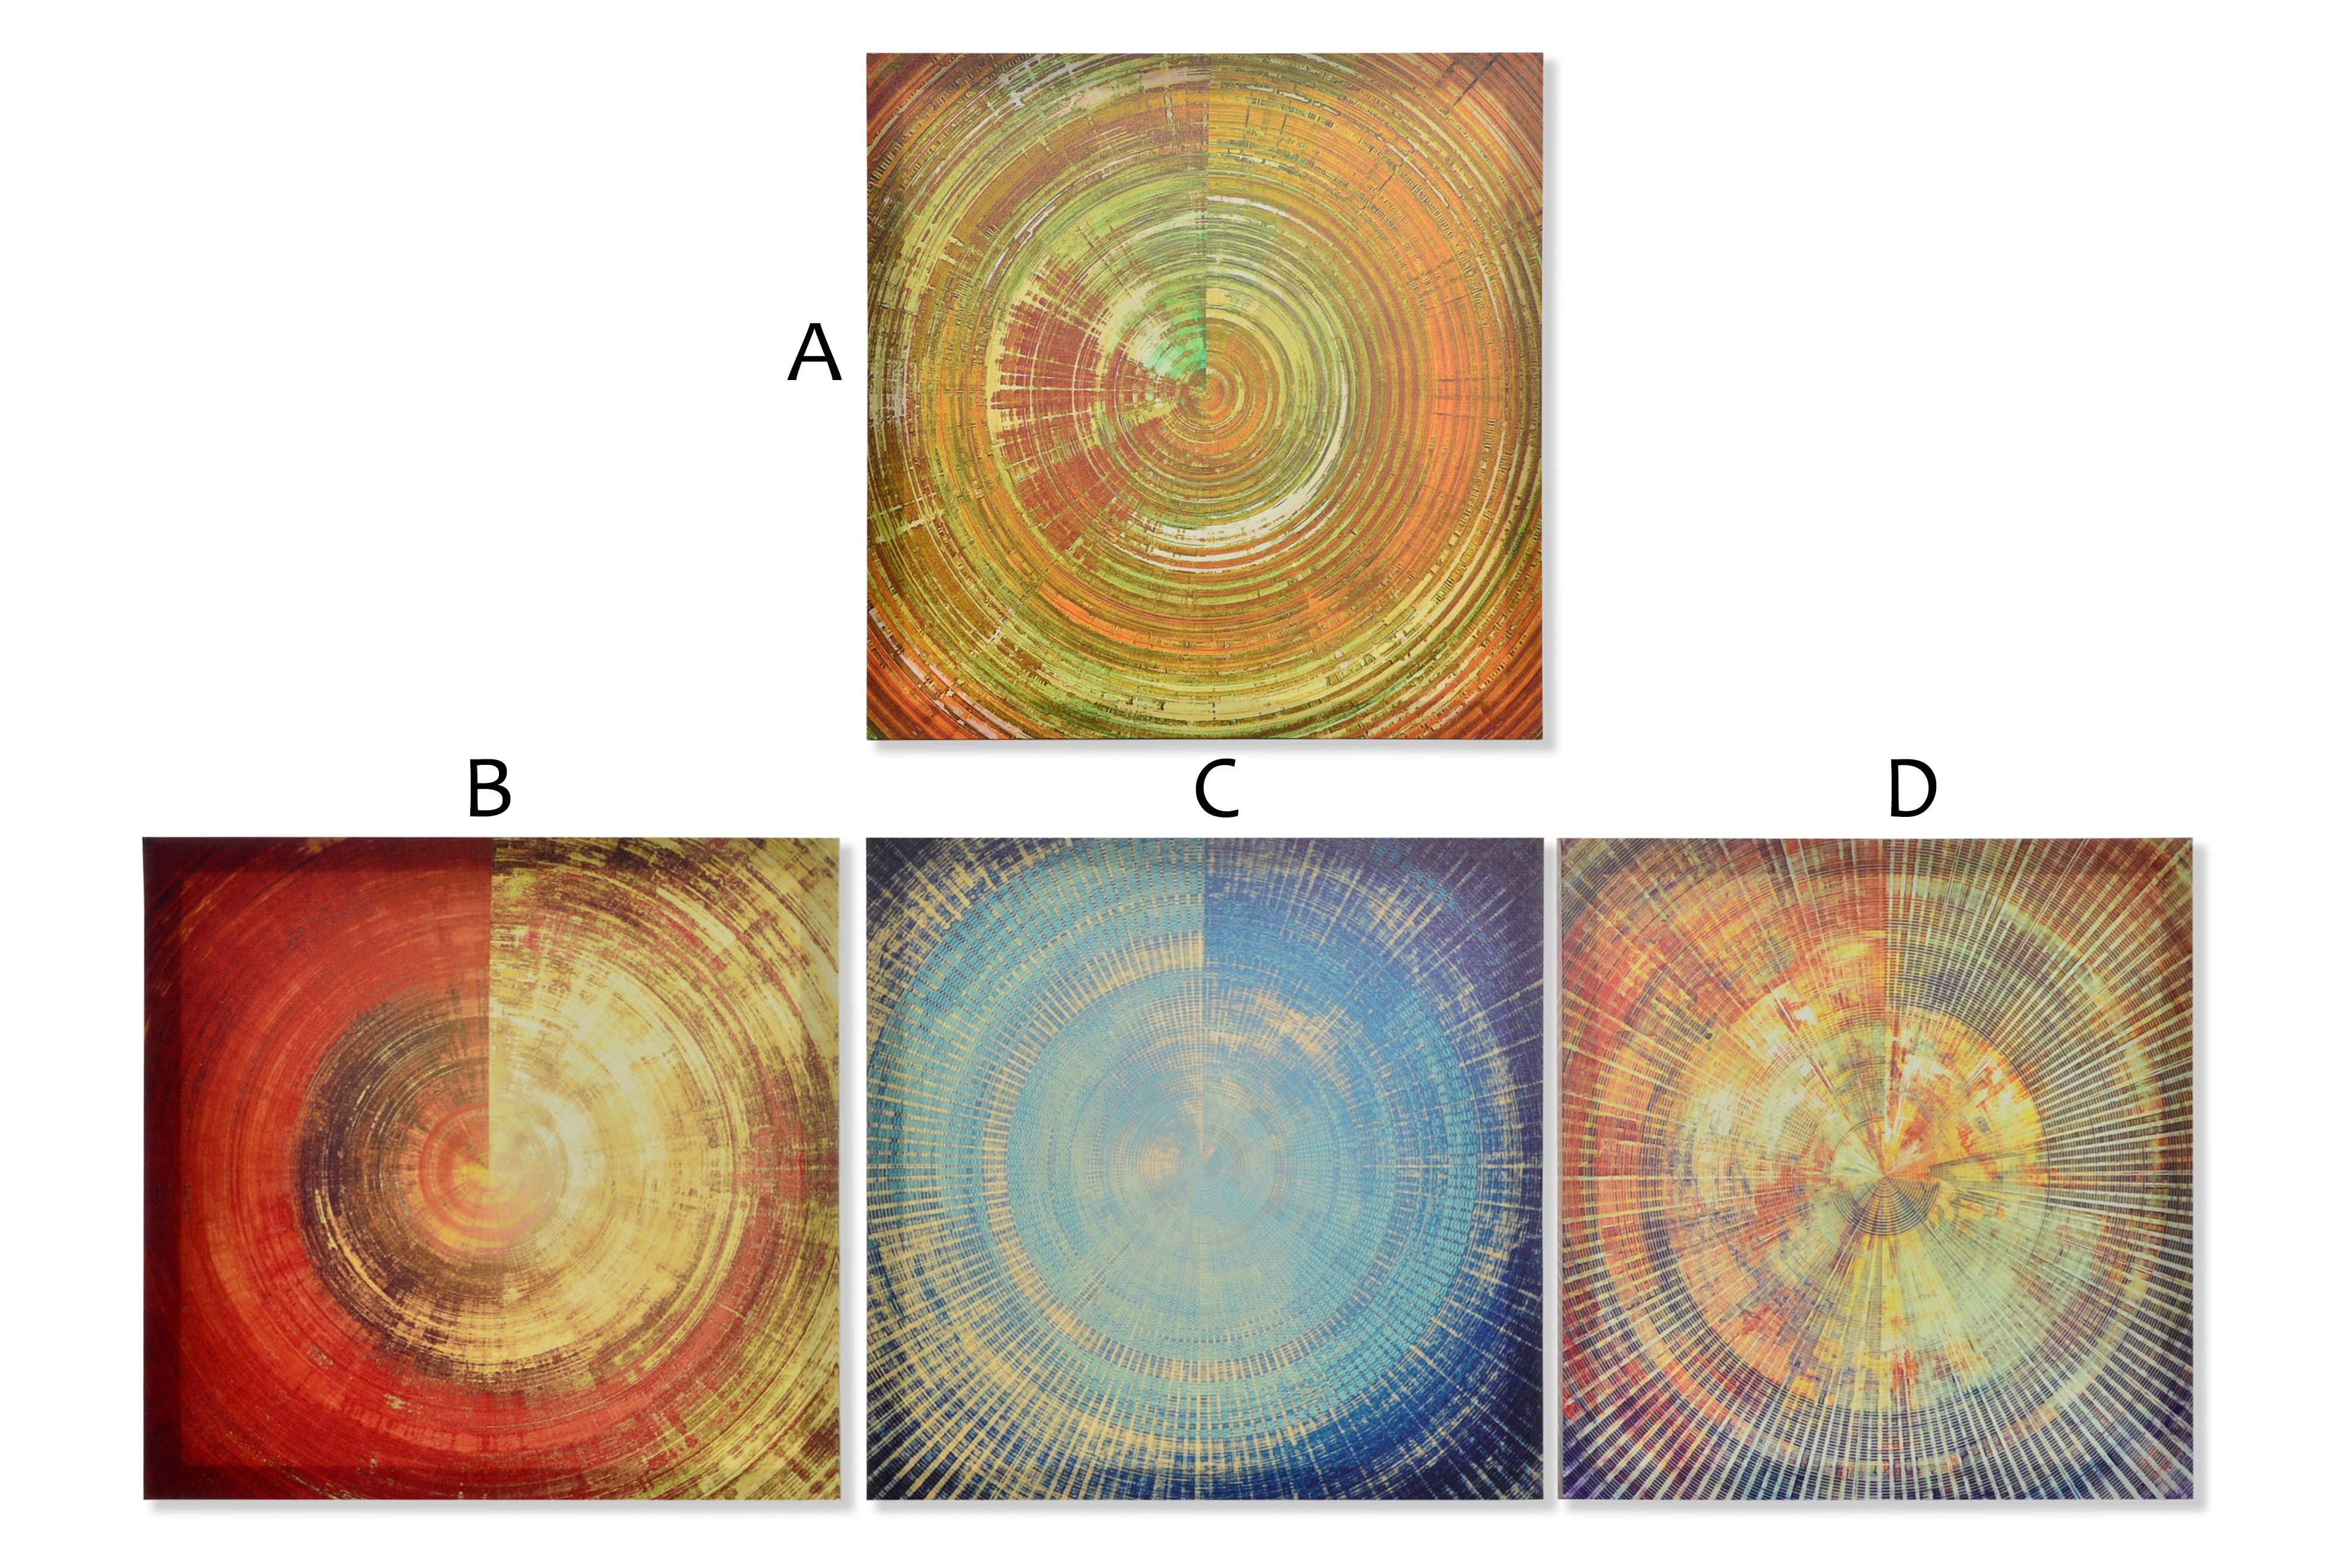 Cuadro decorativo moderno de circulo abstracto en lienzo reforzado de madera Time - Hogar y Mas